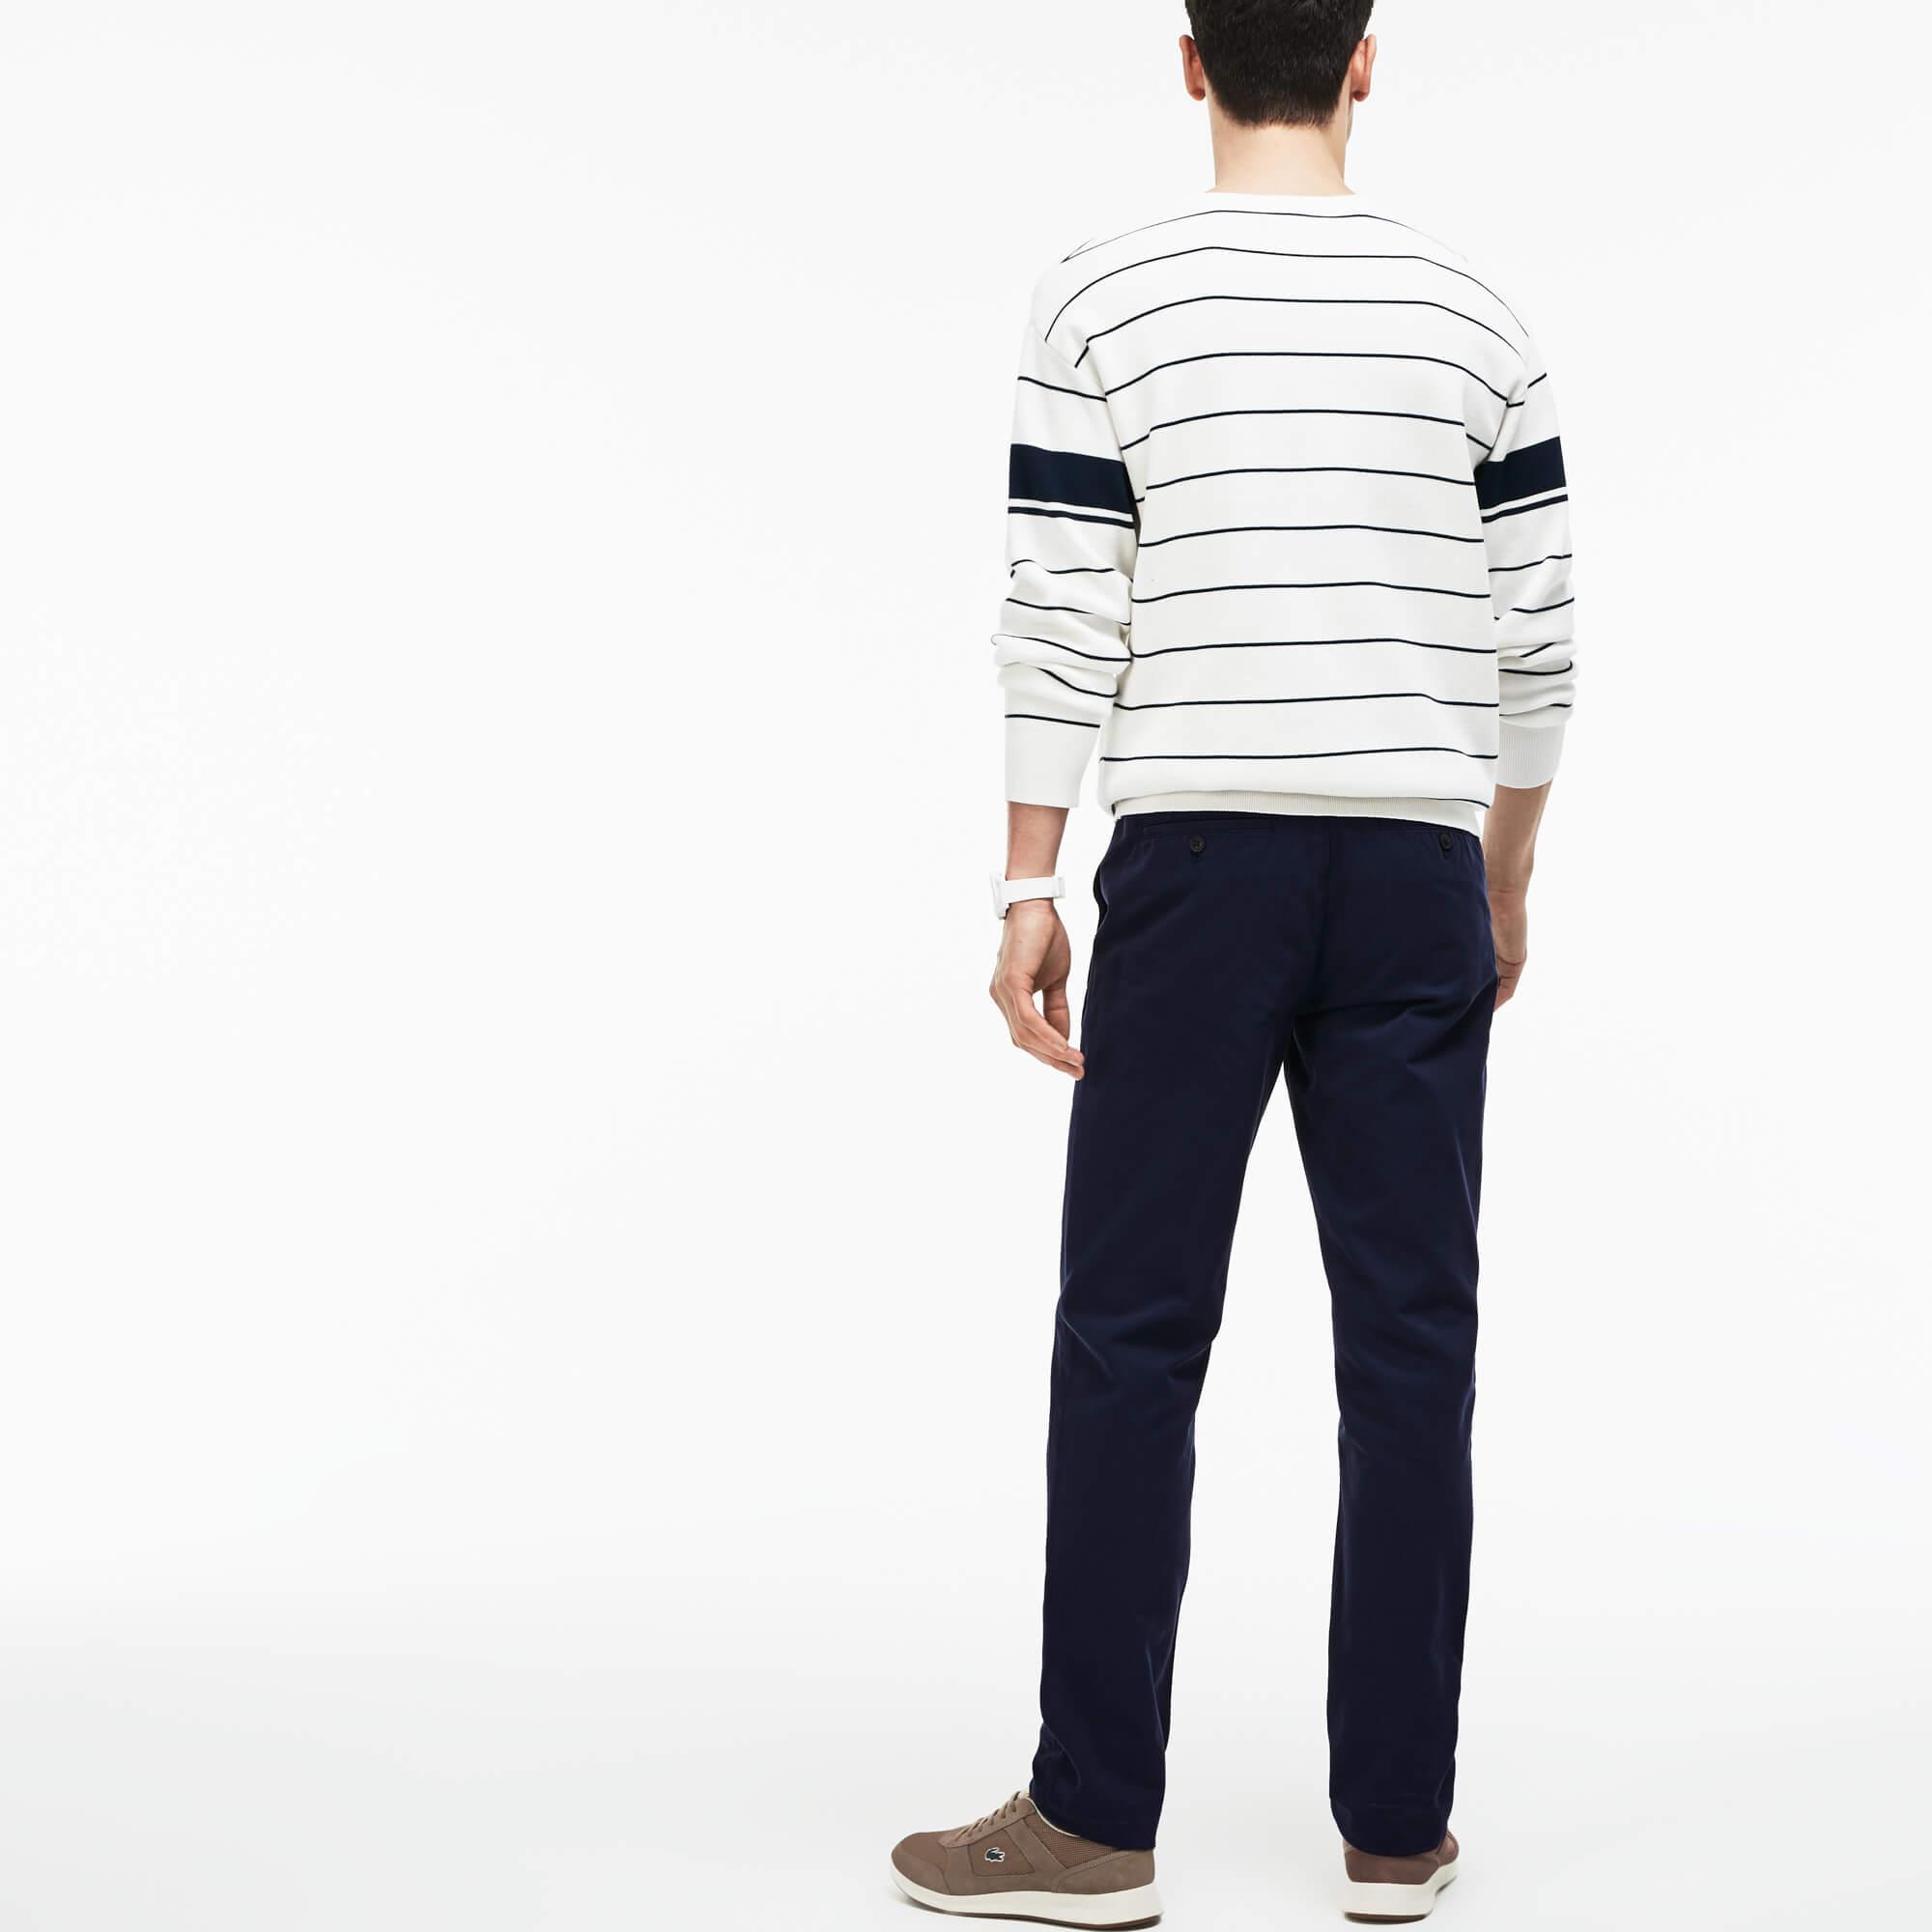 Lacoste Erkek Gabardin Lacivert Pantolon